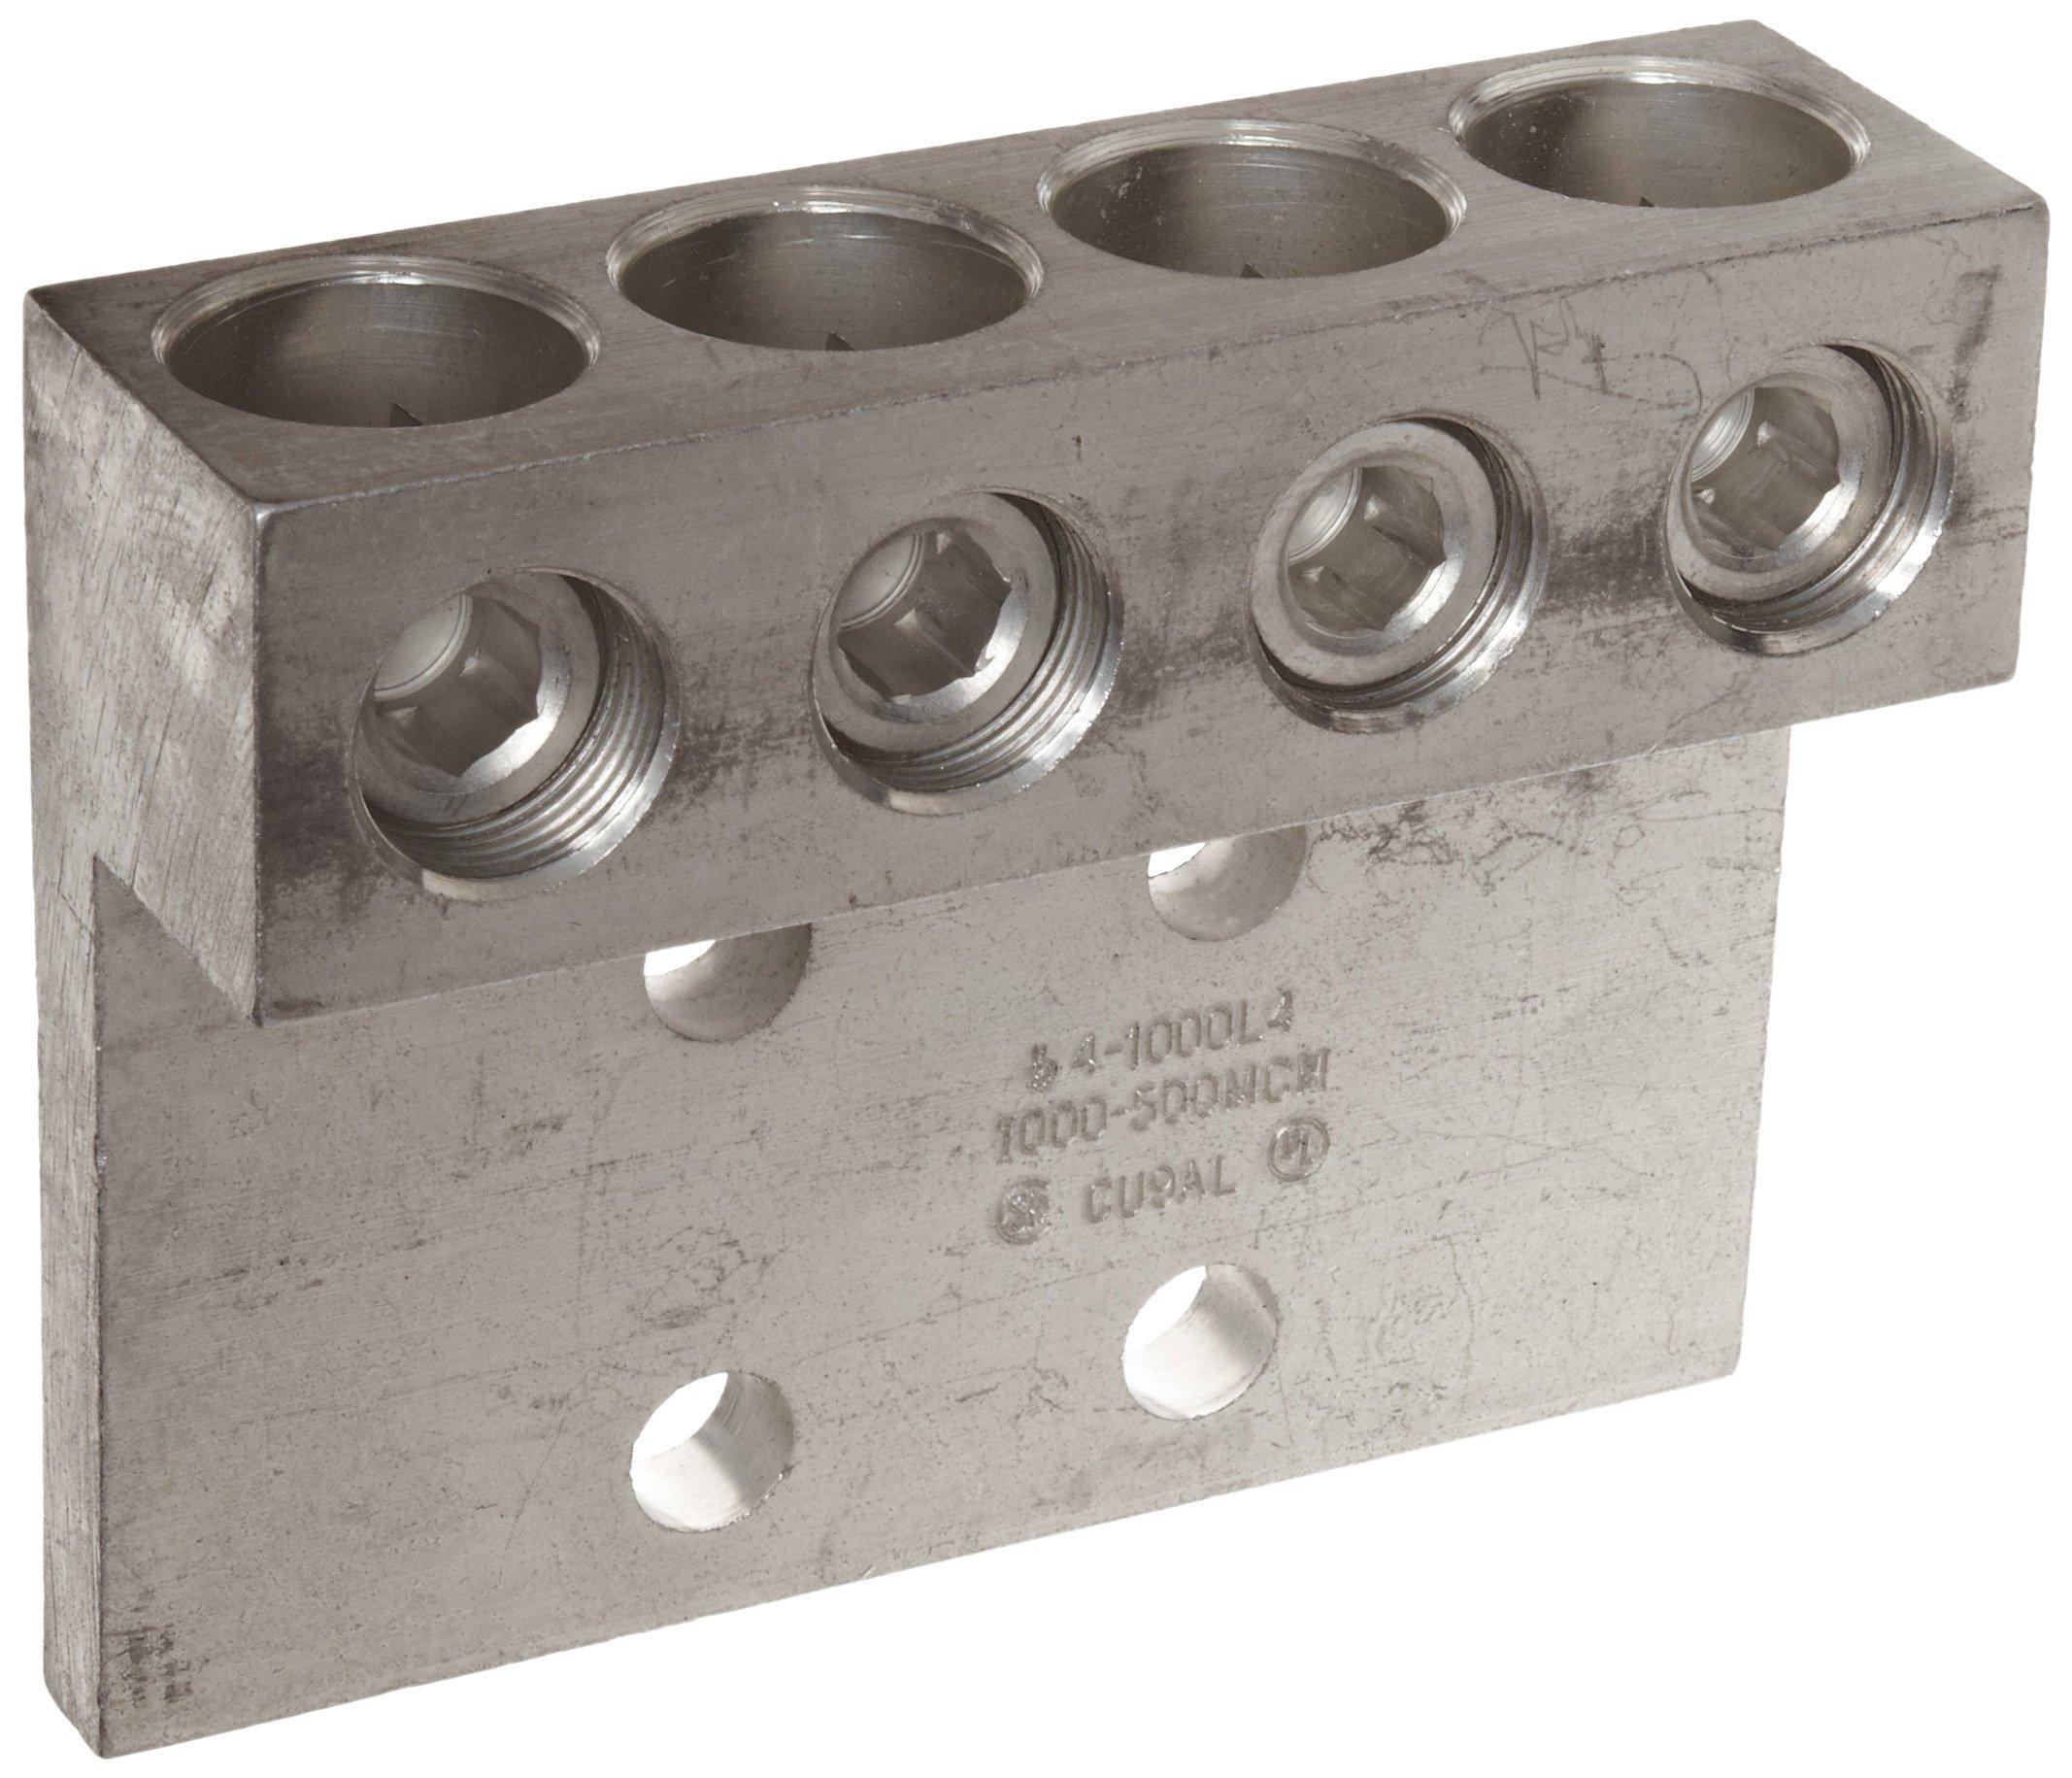 Morris Products 90880 Mechanical Lug, Four Conductors, Four Hole Mount, Aluminum, 1000 AWG, 1000mcm - 500mcm Wire Range